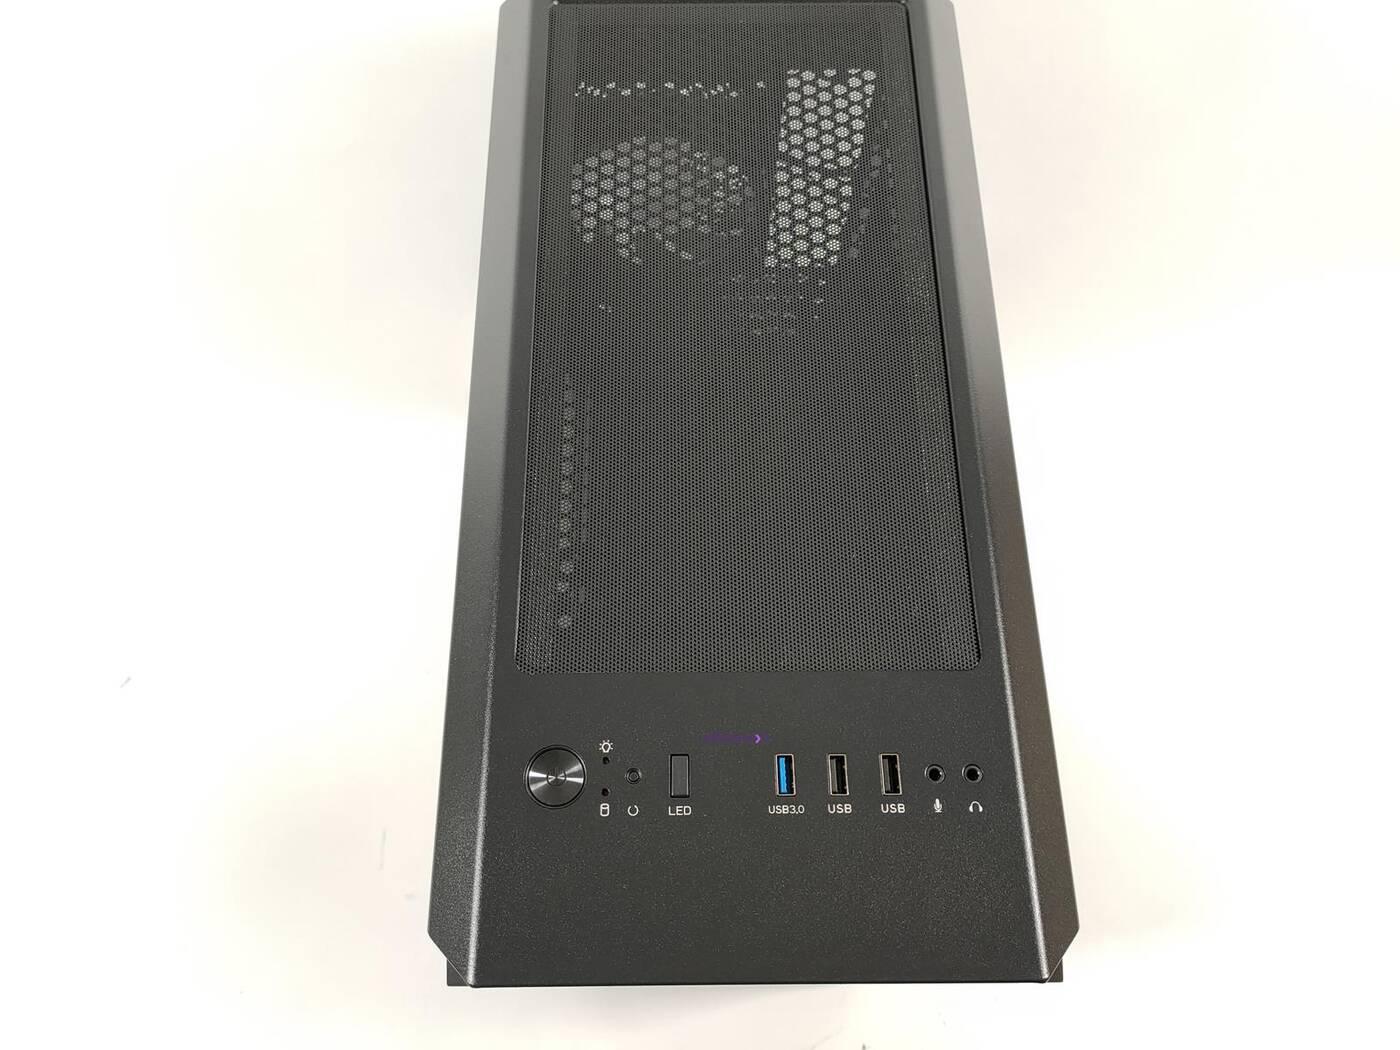 test Genesis Irid 503 ARGB, recenzja Genesis Irid 503 ARGB, review Genesis Irid 503 ARGB, opinia Genesis Irid 503 ARGB